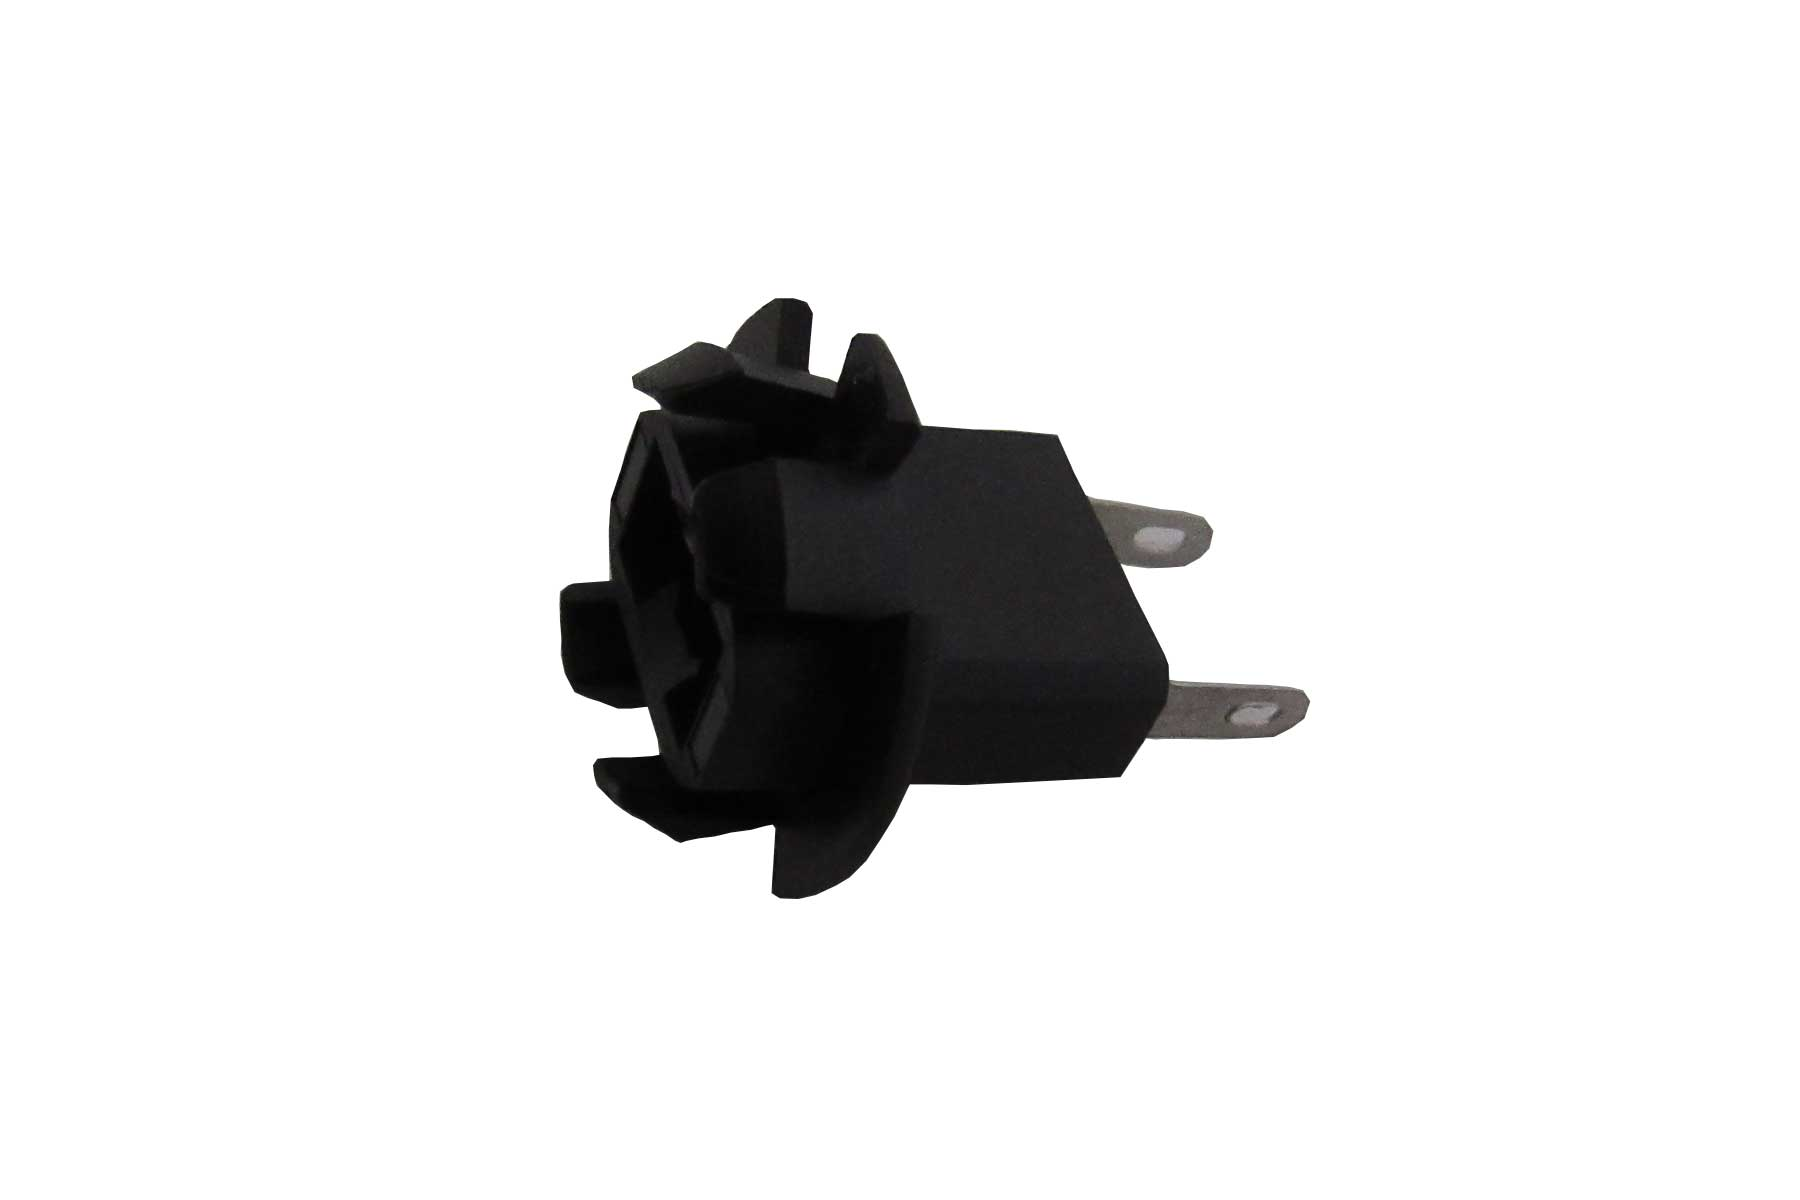 Miniature T3 Wedge Base and Halogen Candelabra Bayonet Base Plug Button Socket